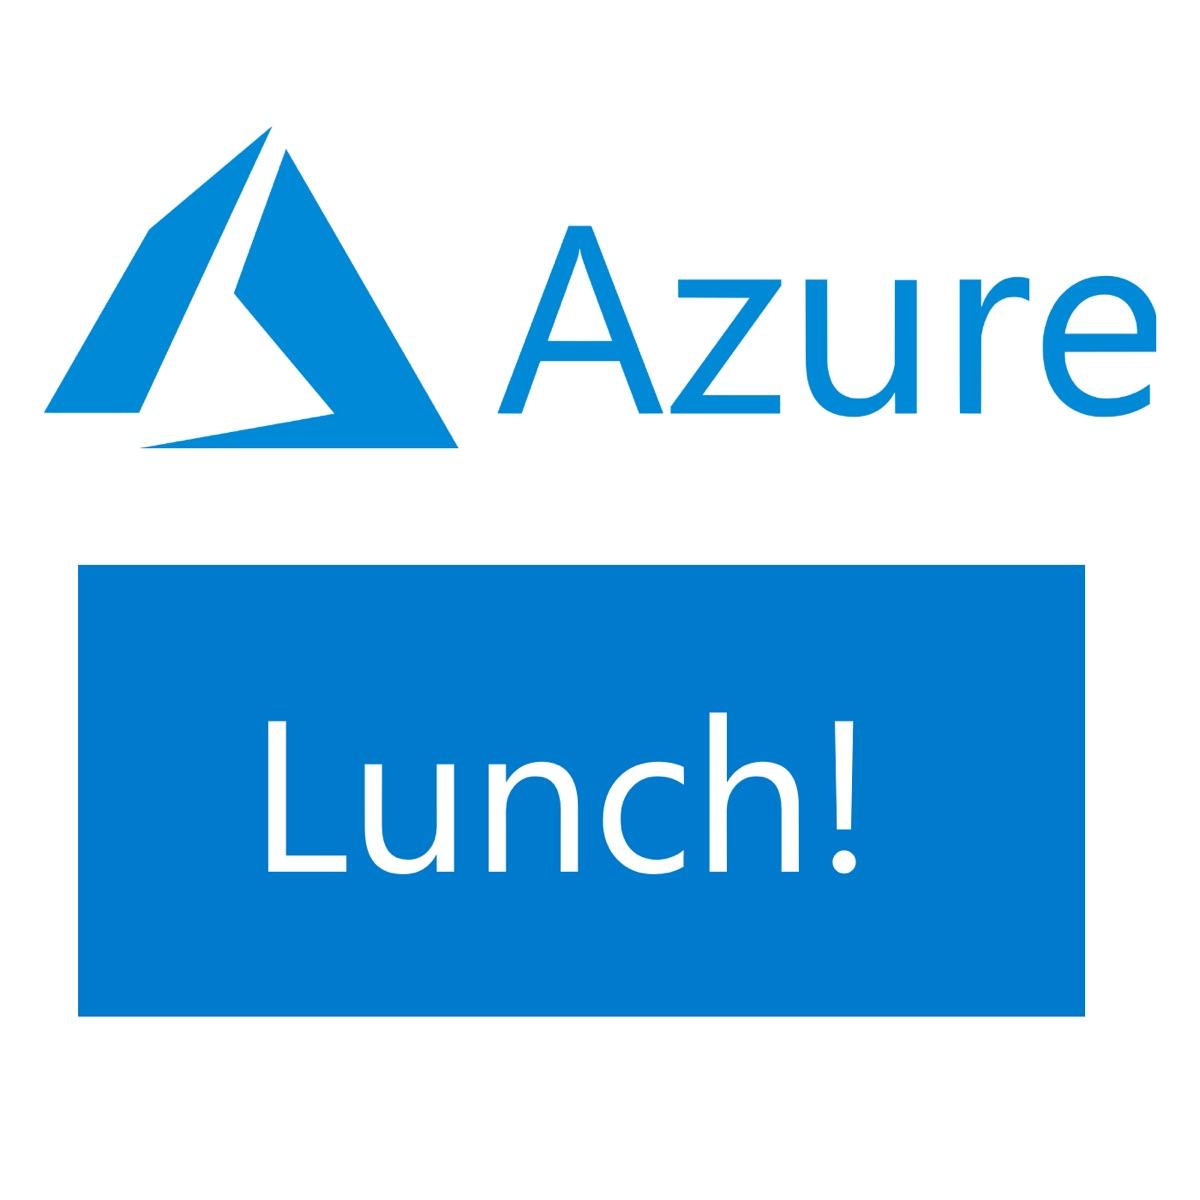 Azure Lunch